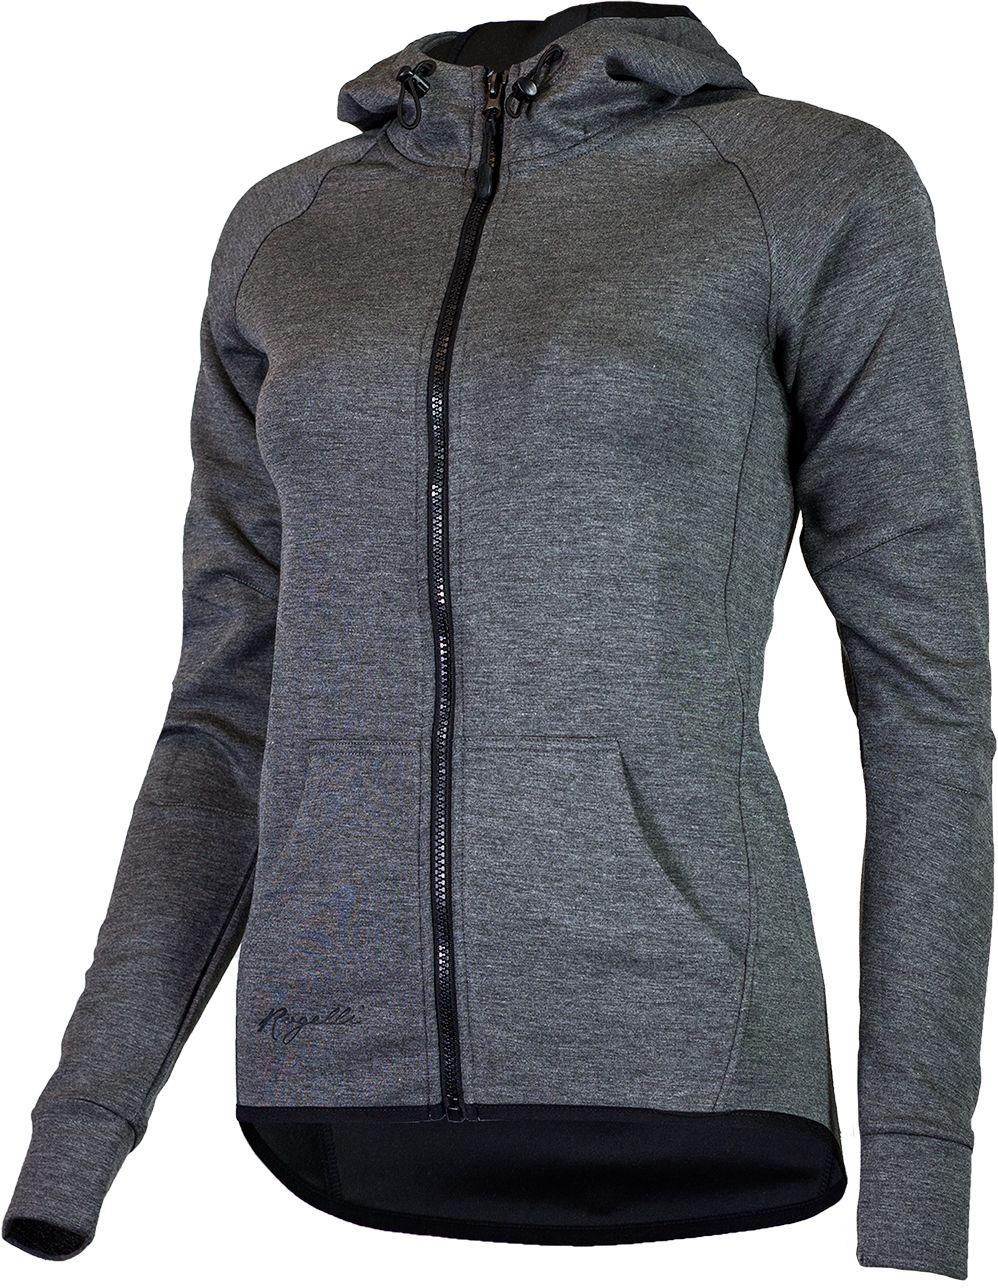 ROGELLI damska bluza z kapturem TRAINING szara Rozmiar: XL,050.609.XS